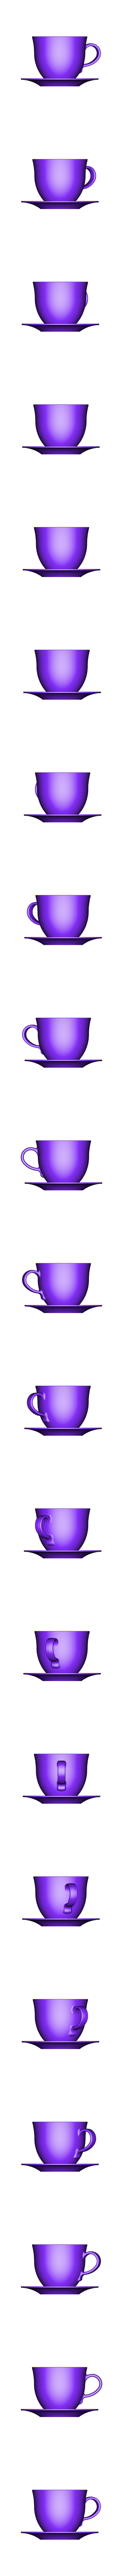 coffee_set_LED_candle.STL Download STL file coffee_set_LED_candle • 3D printer model, 3D_parts